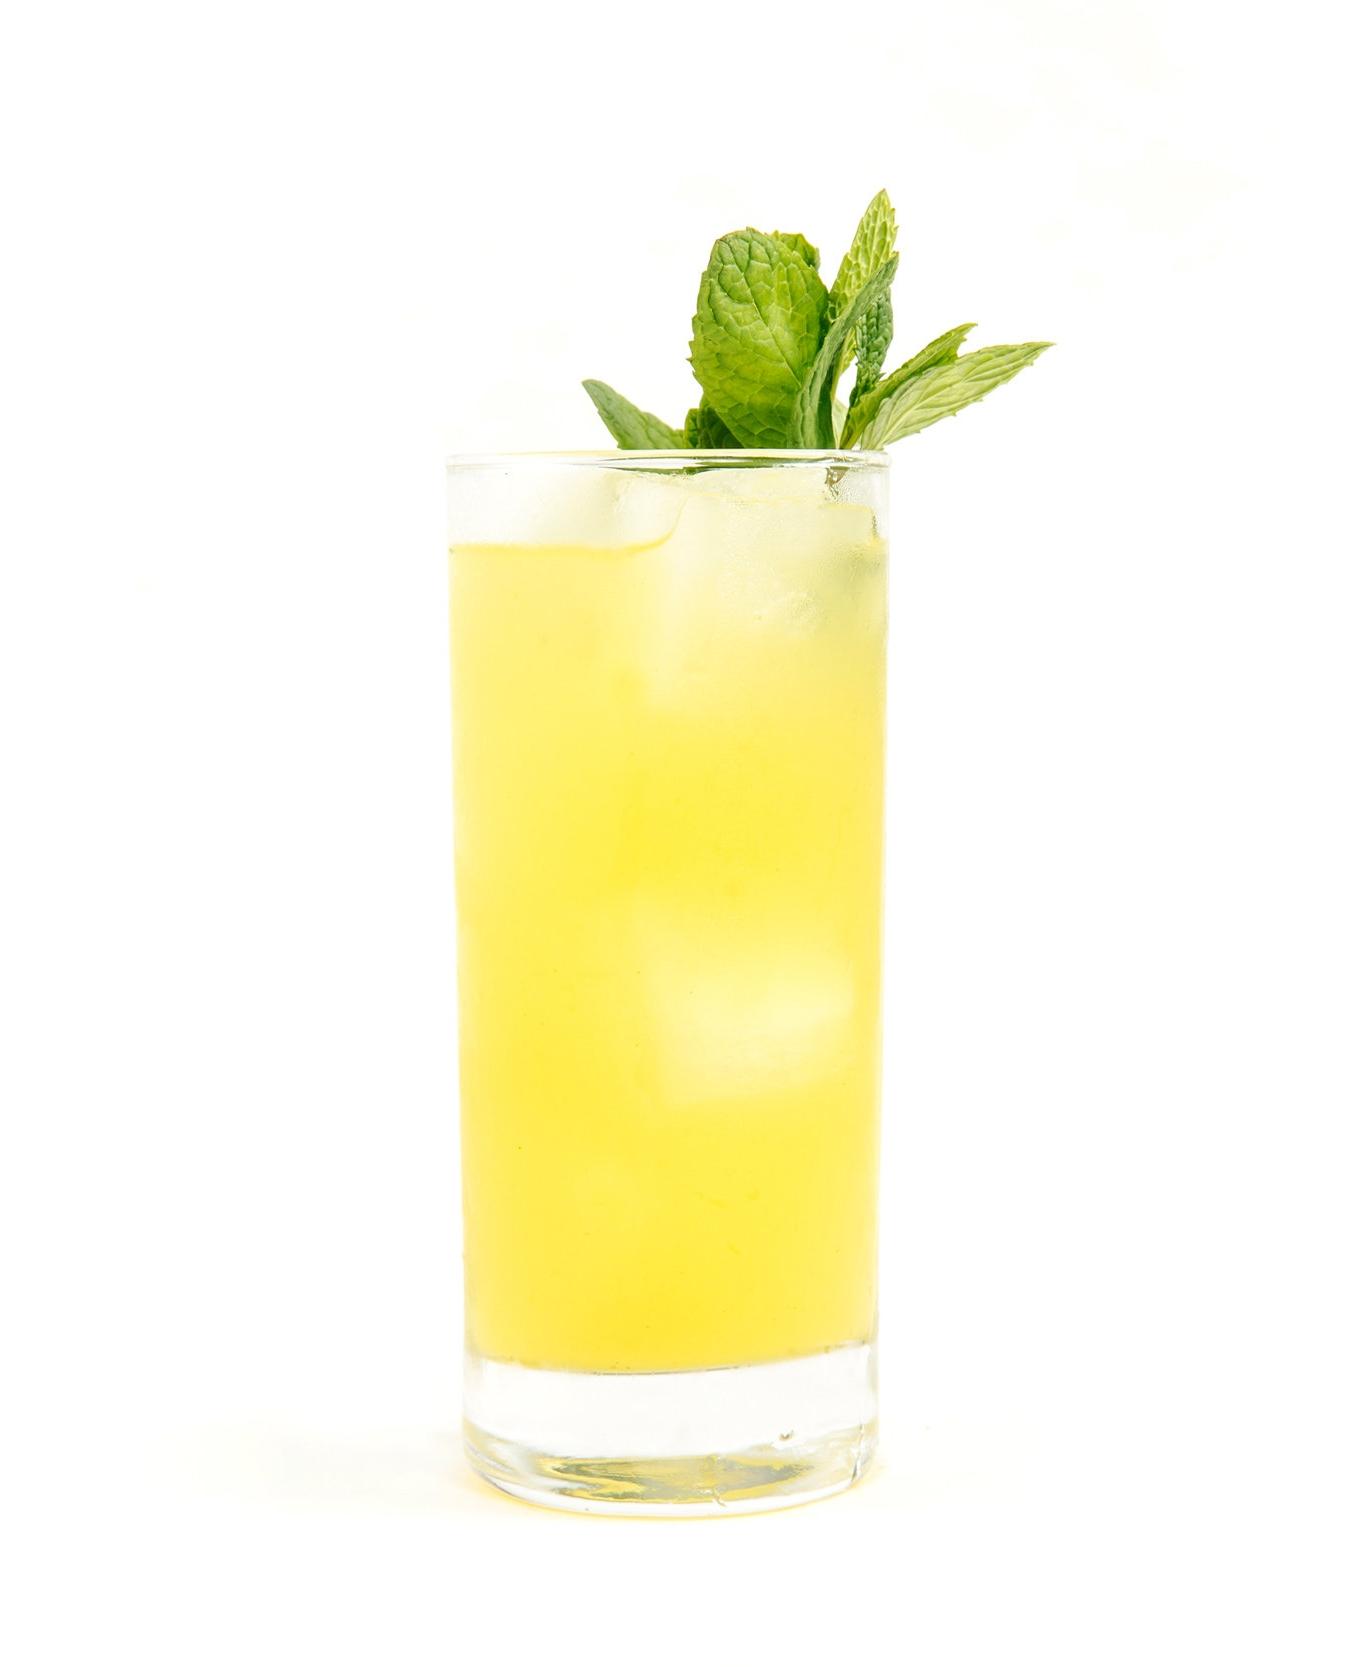 SPRING FLING - 2 oz gin or vodka1/2 oz nostrum pineapple turmeric ginger shrub1/2 oz fresh lime juice3 oz tonic waterBuild over ice.